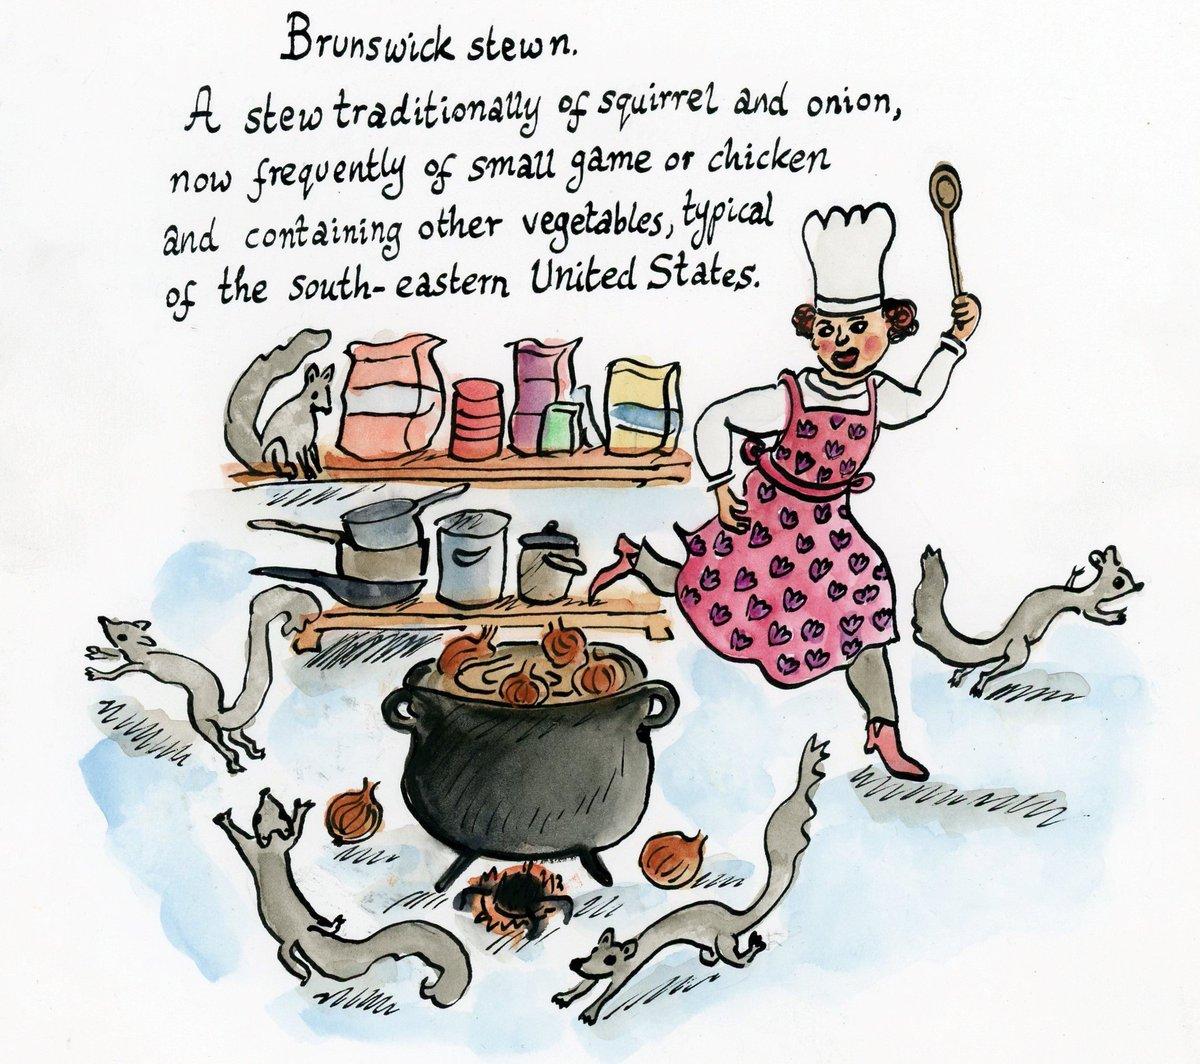 test Twitter Media - OED Word of the Day: Brunswick stew, n. (image by @imogenfoxell) https://t.co/sRW2E1231b https://t.co/VjOEUO8CQh